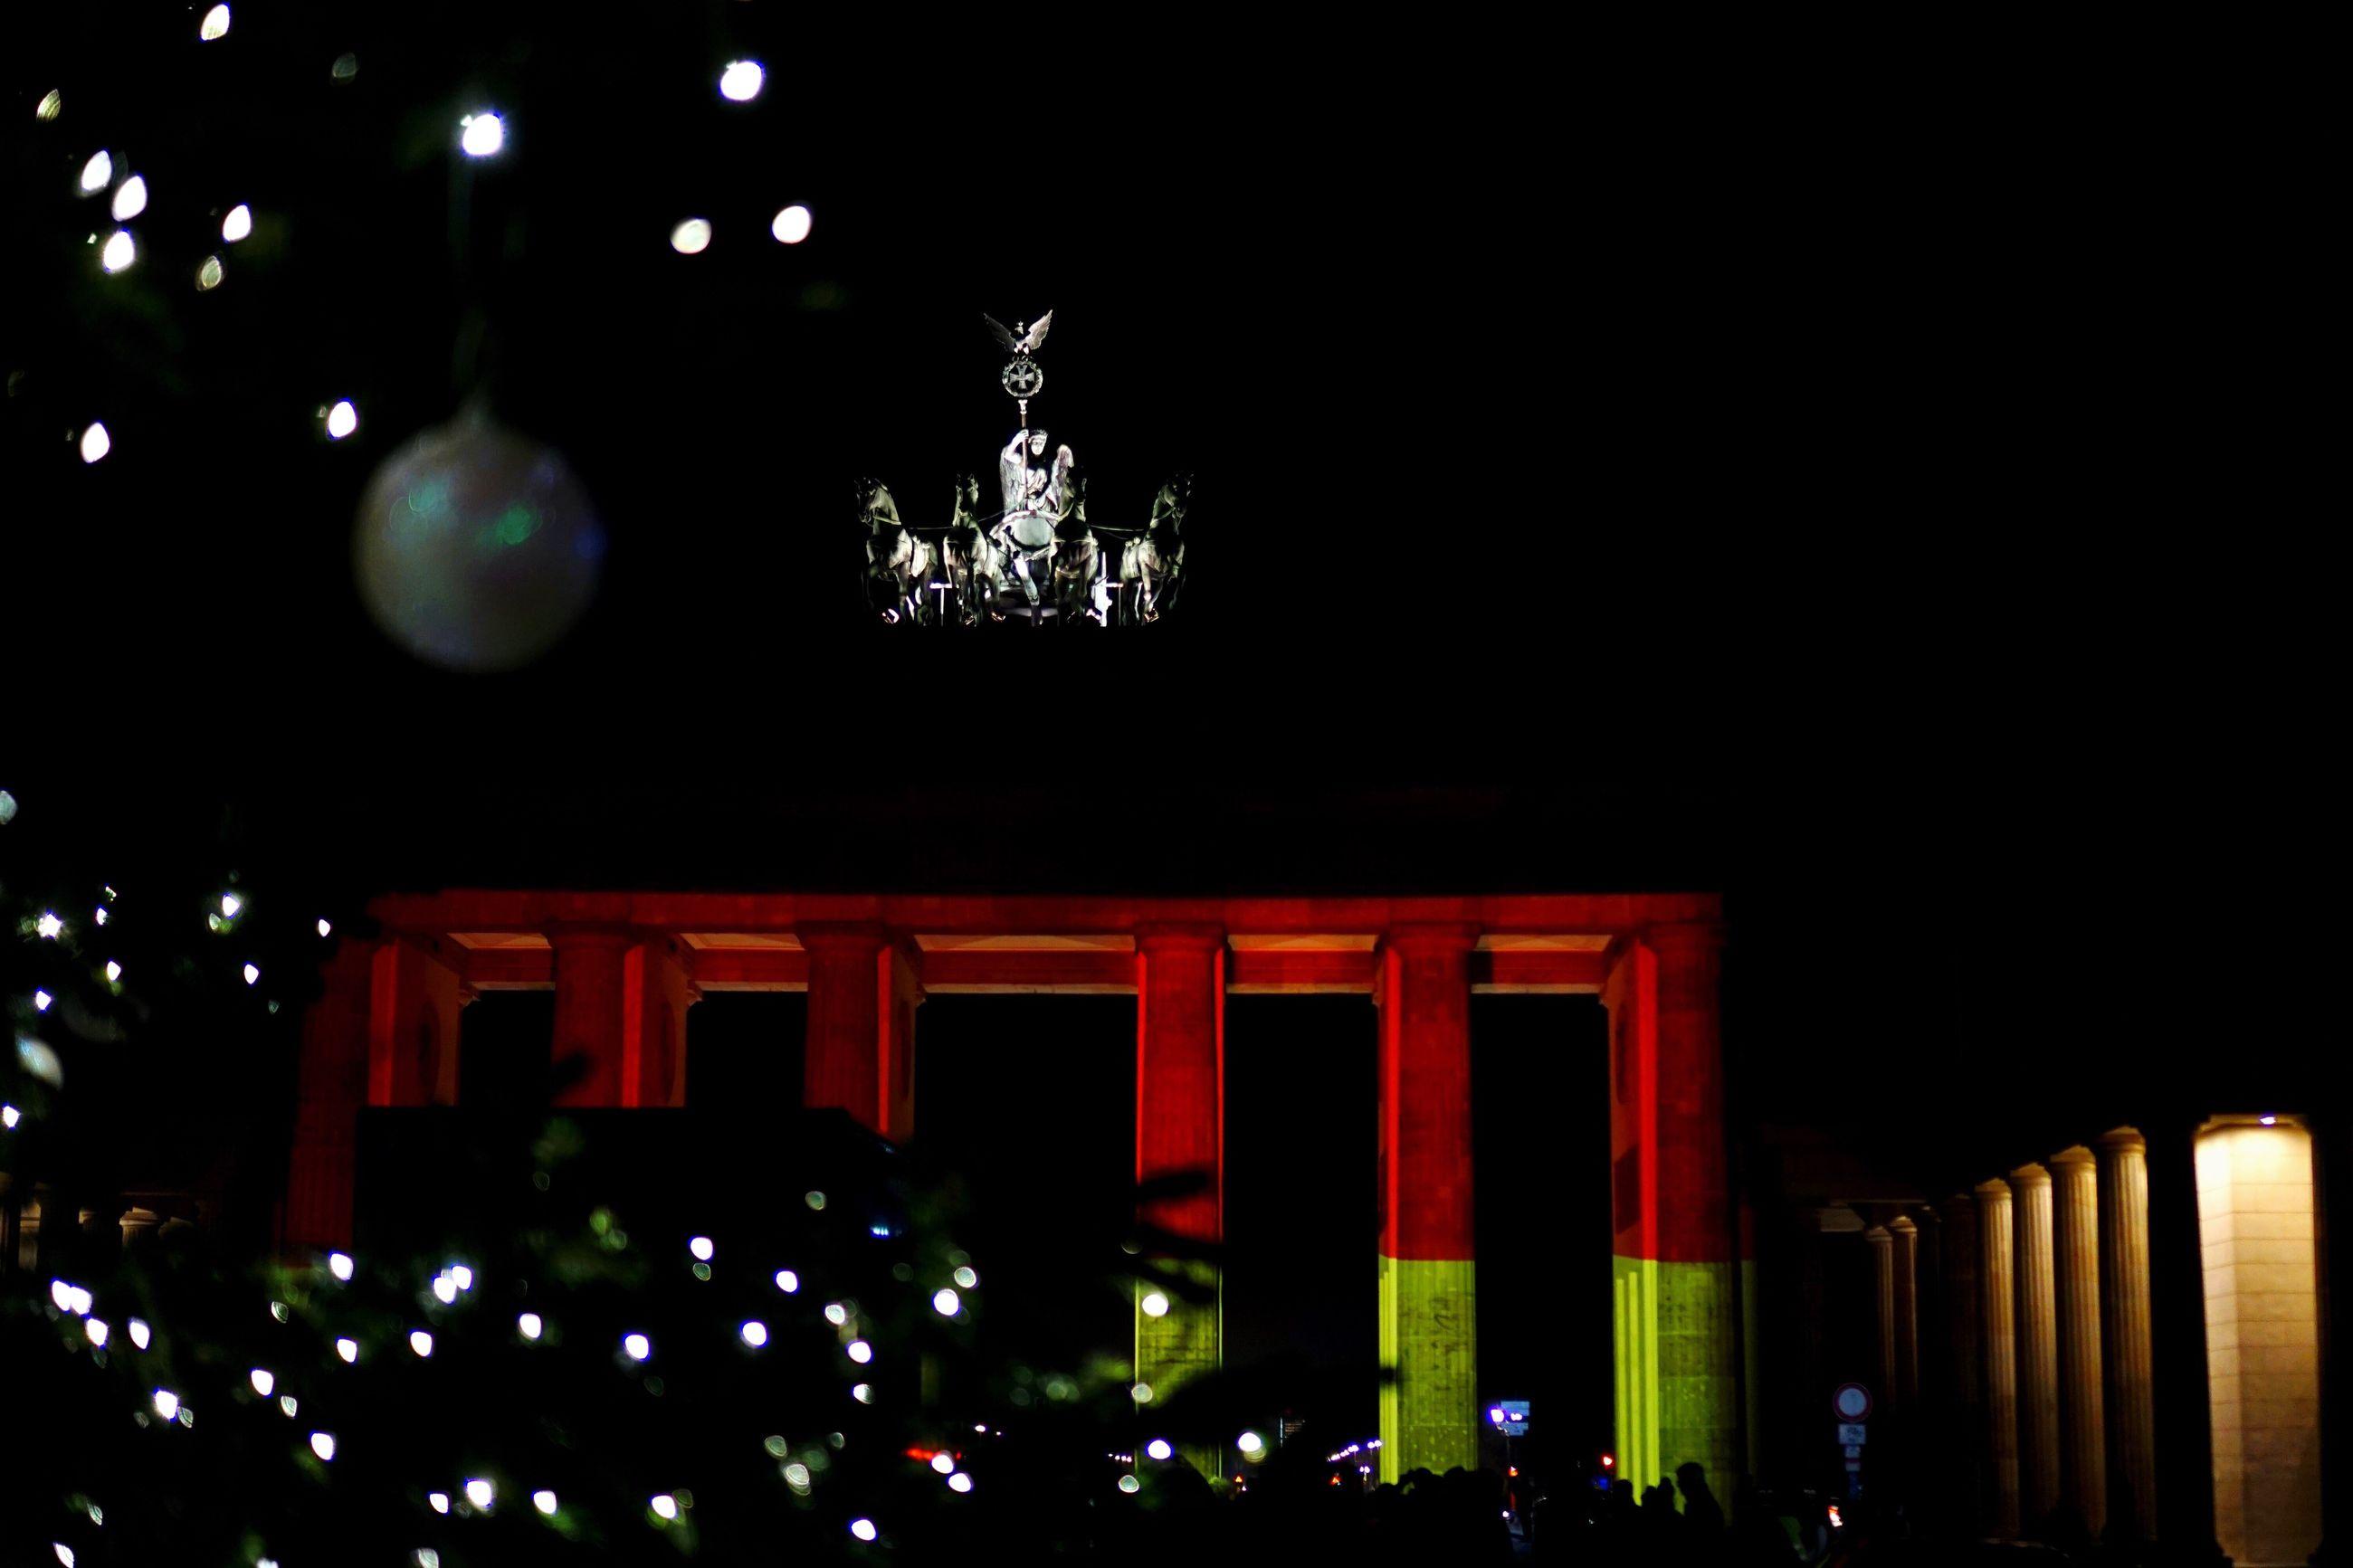 Illuminated christmas lighting decoration at brandenburg gate during night